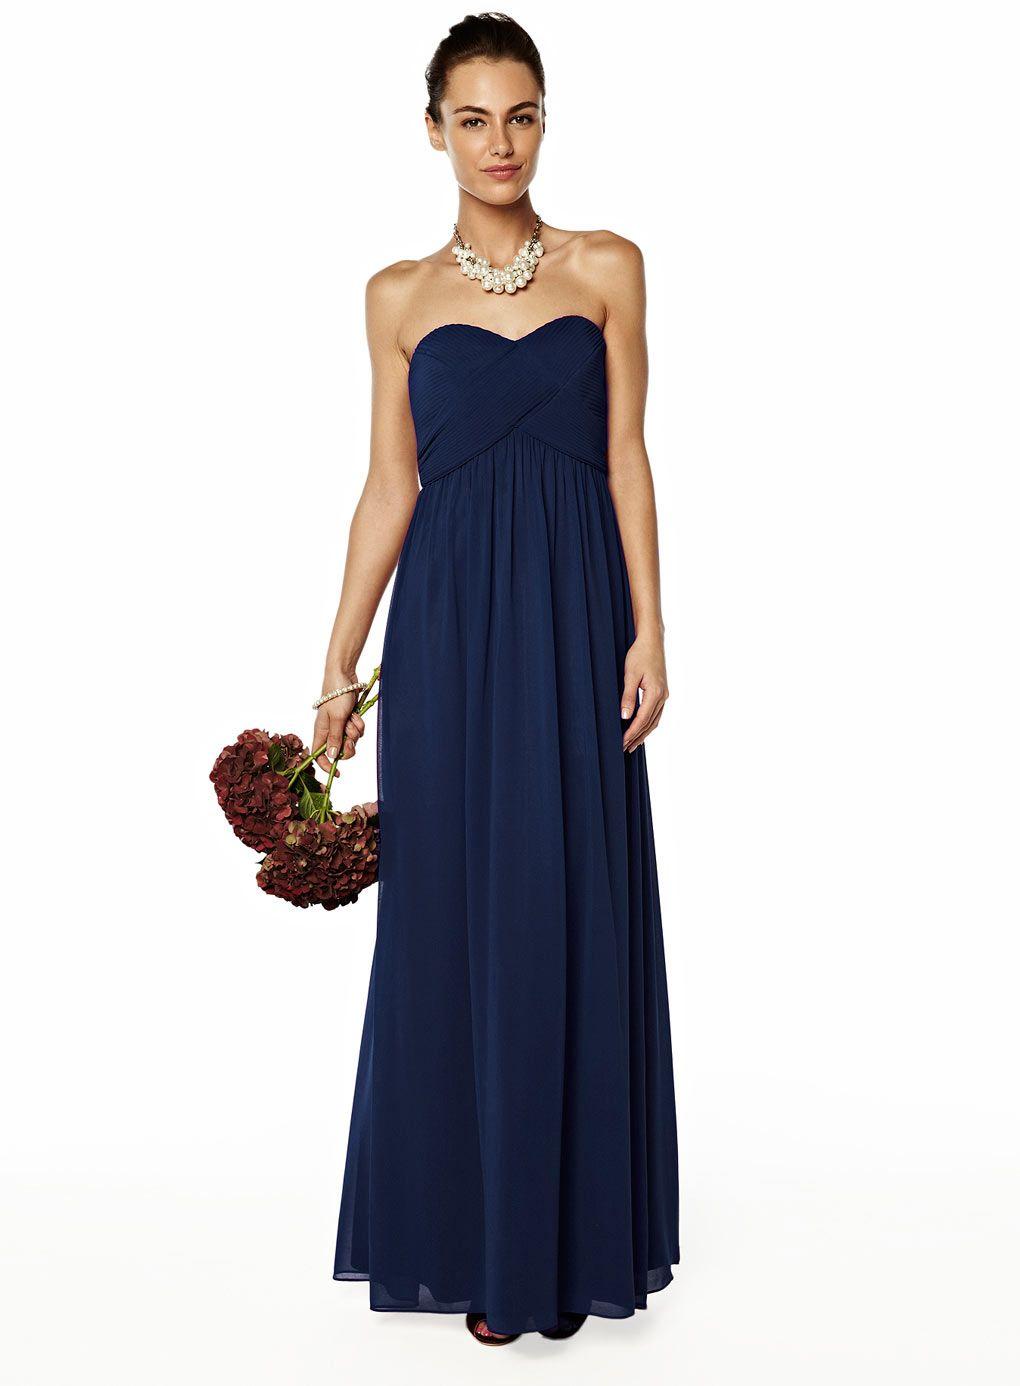 Bhs bandaue dress with optional straps wedding pinterest